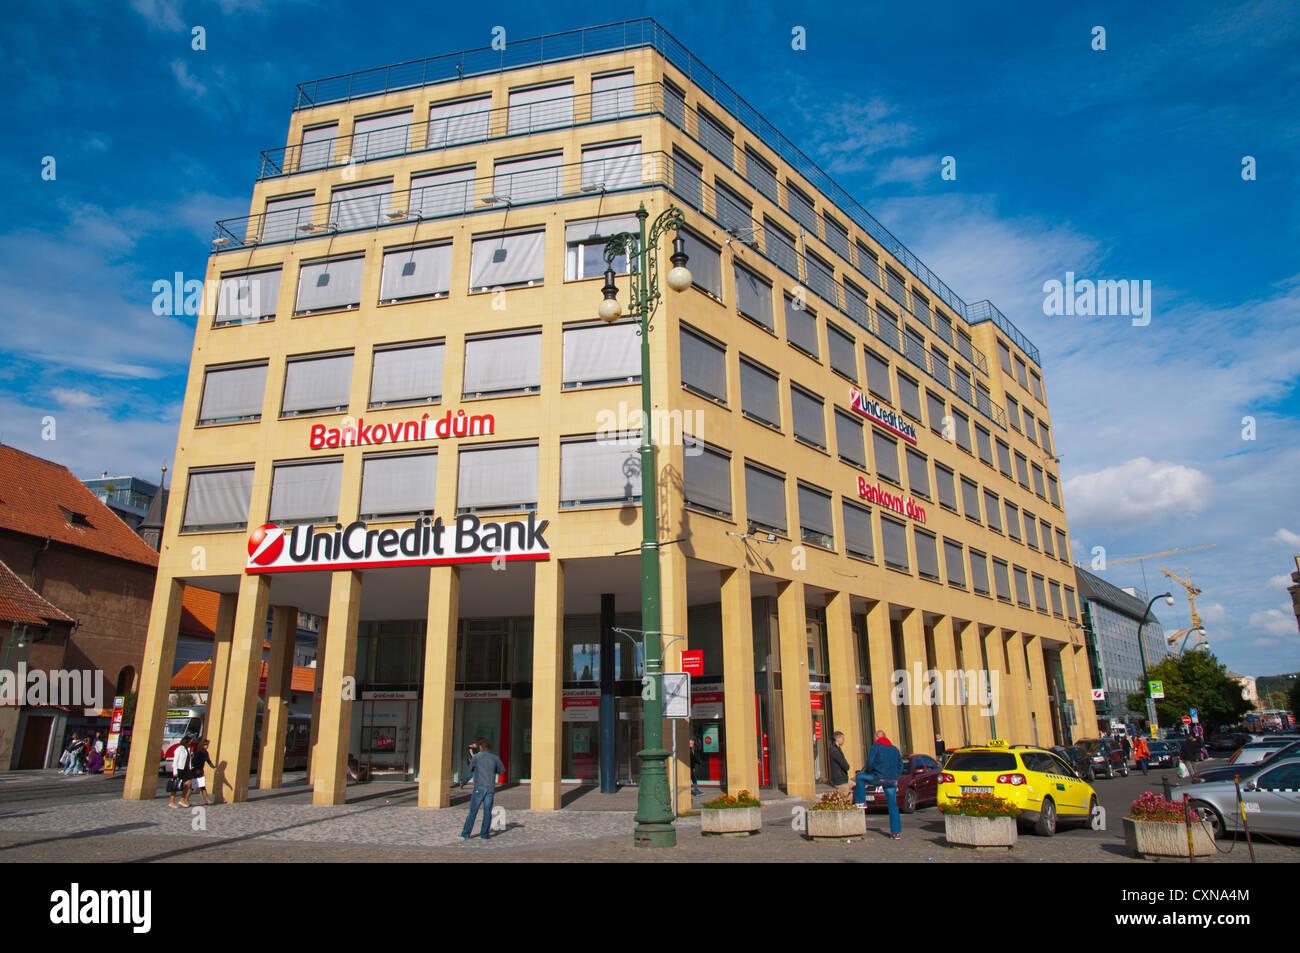 Bankovni dum the Banking house Namesti Republiky square central Prague Czech Republic Europe - Stock Image